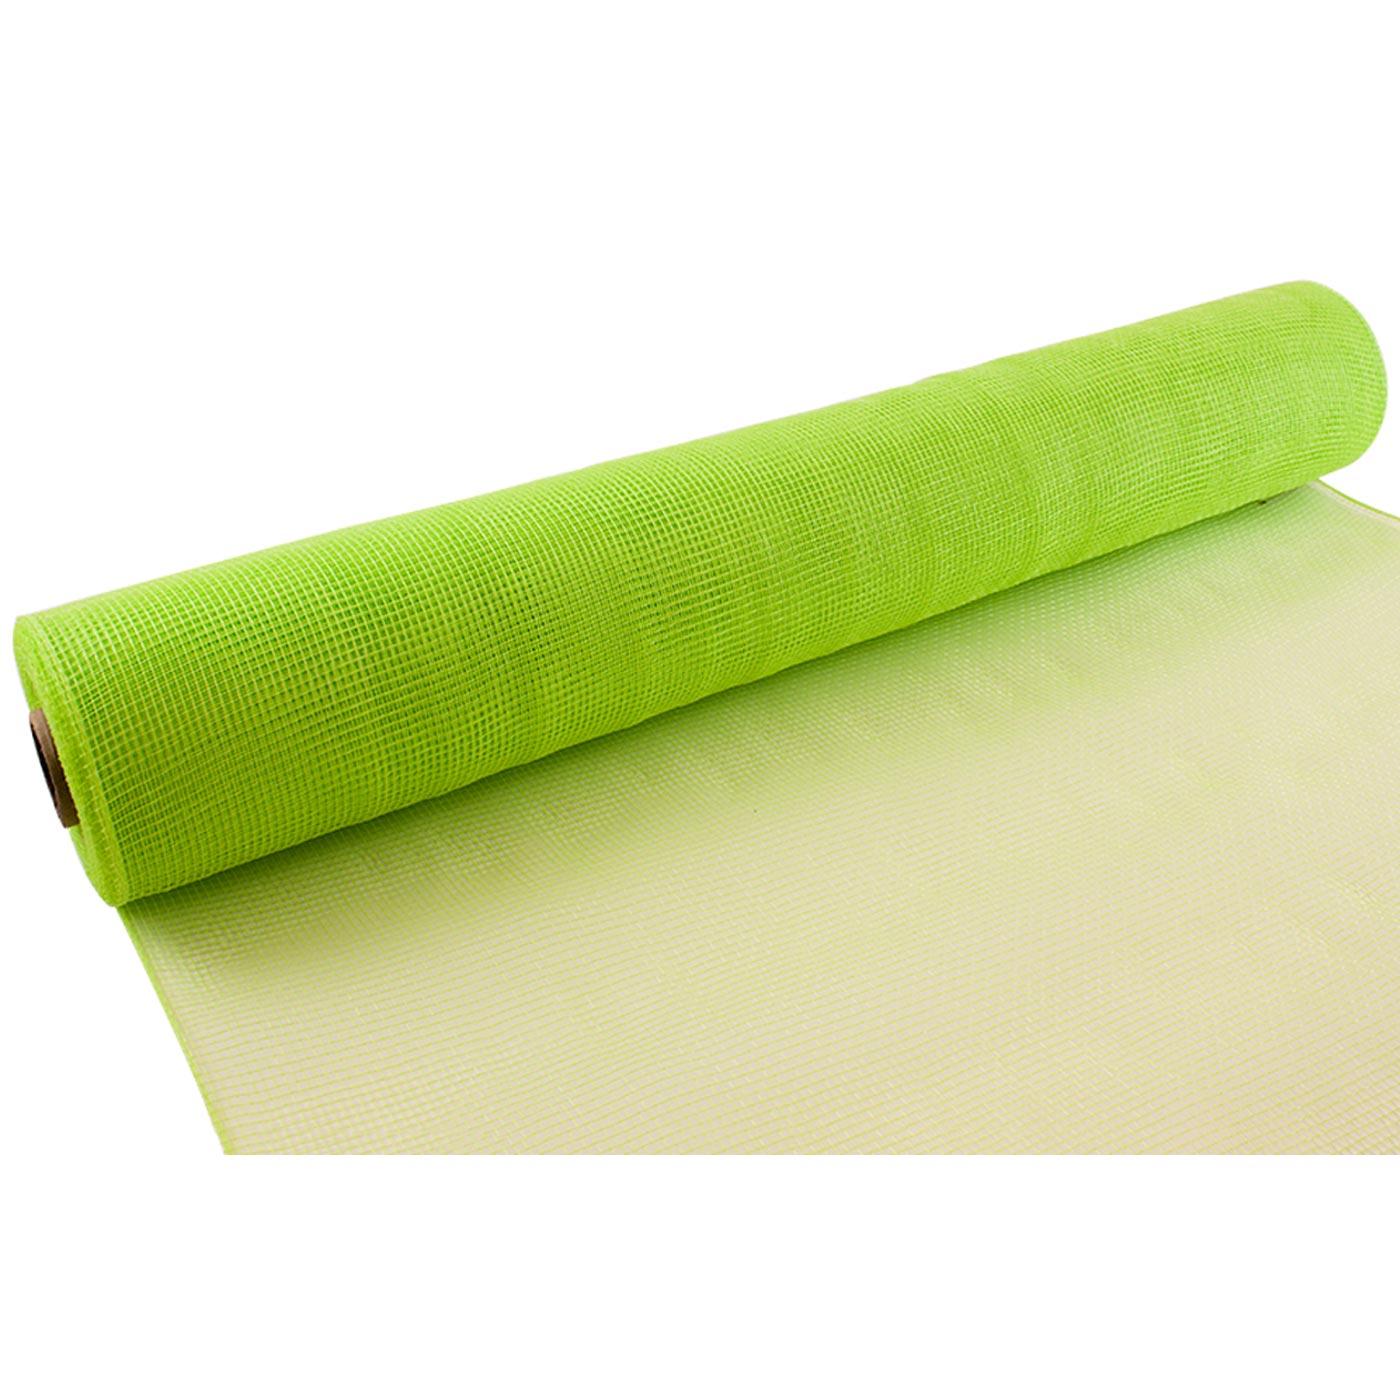 Deco Mesh 53cm Lime Green